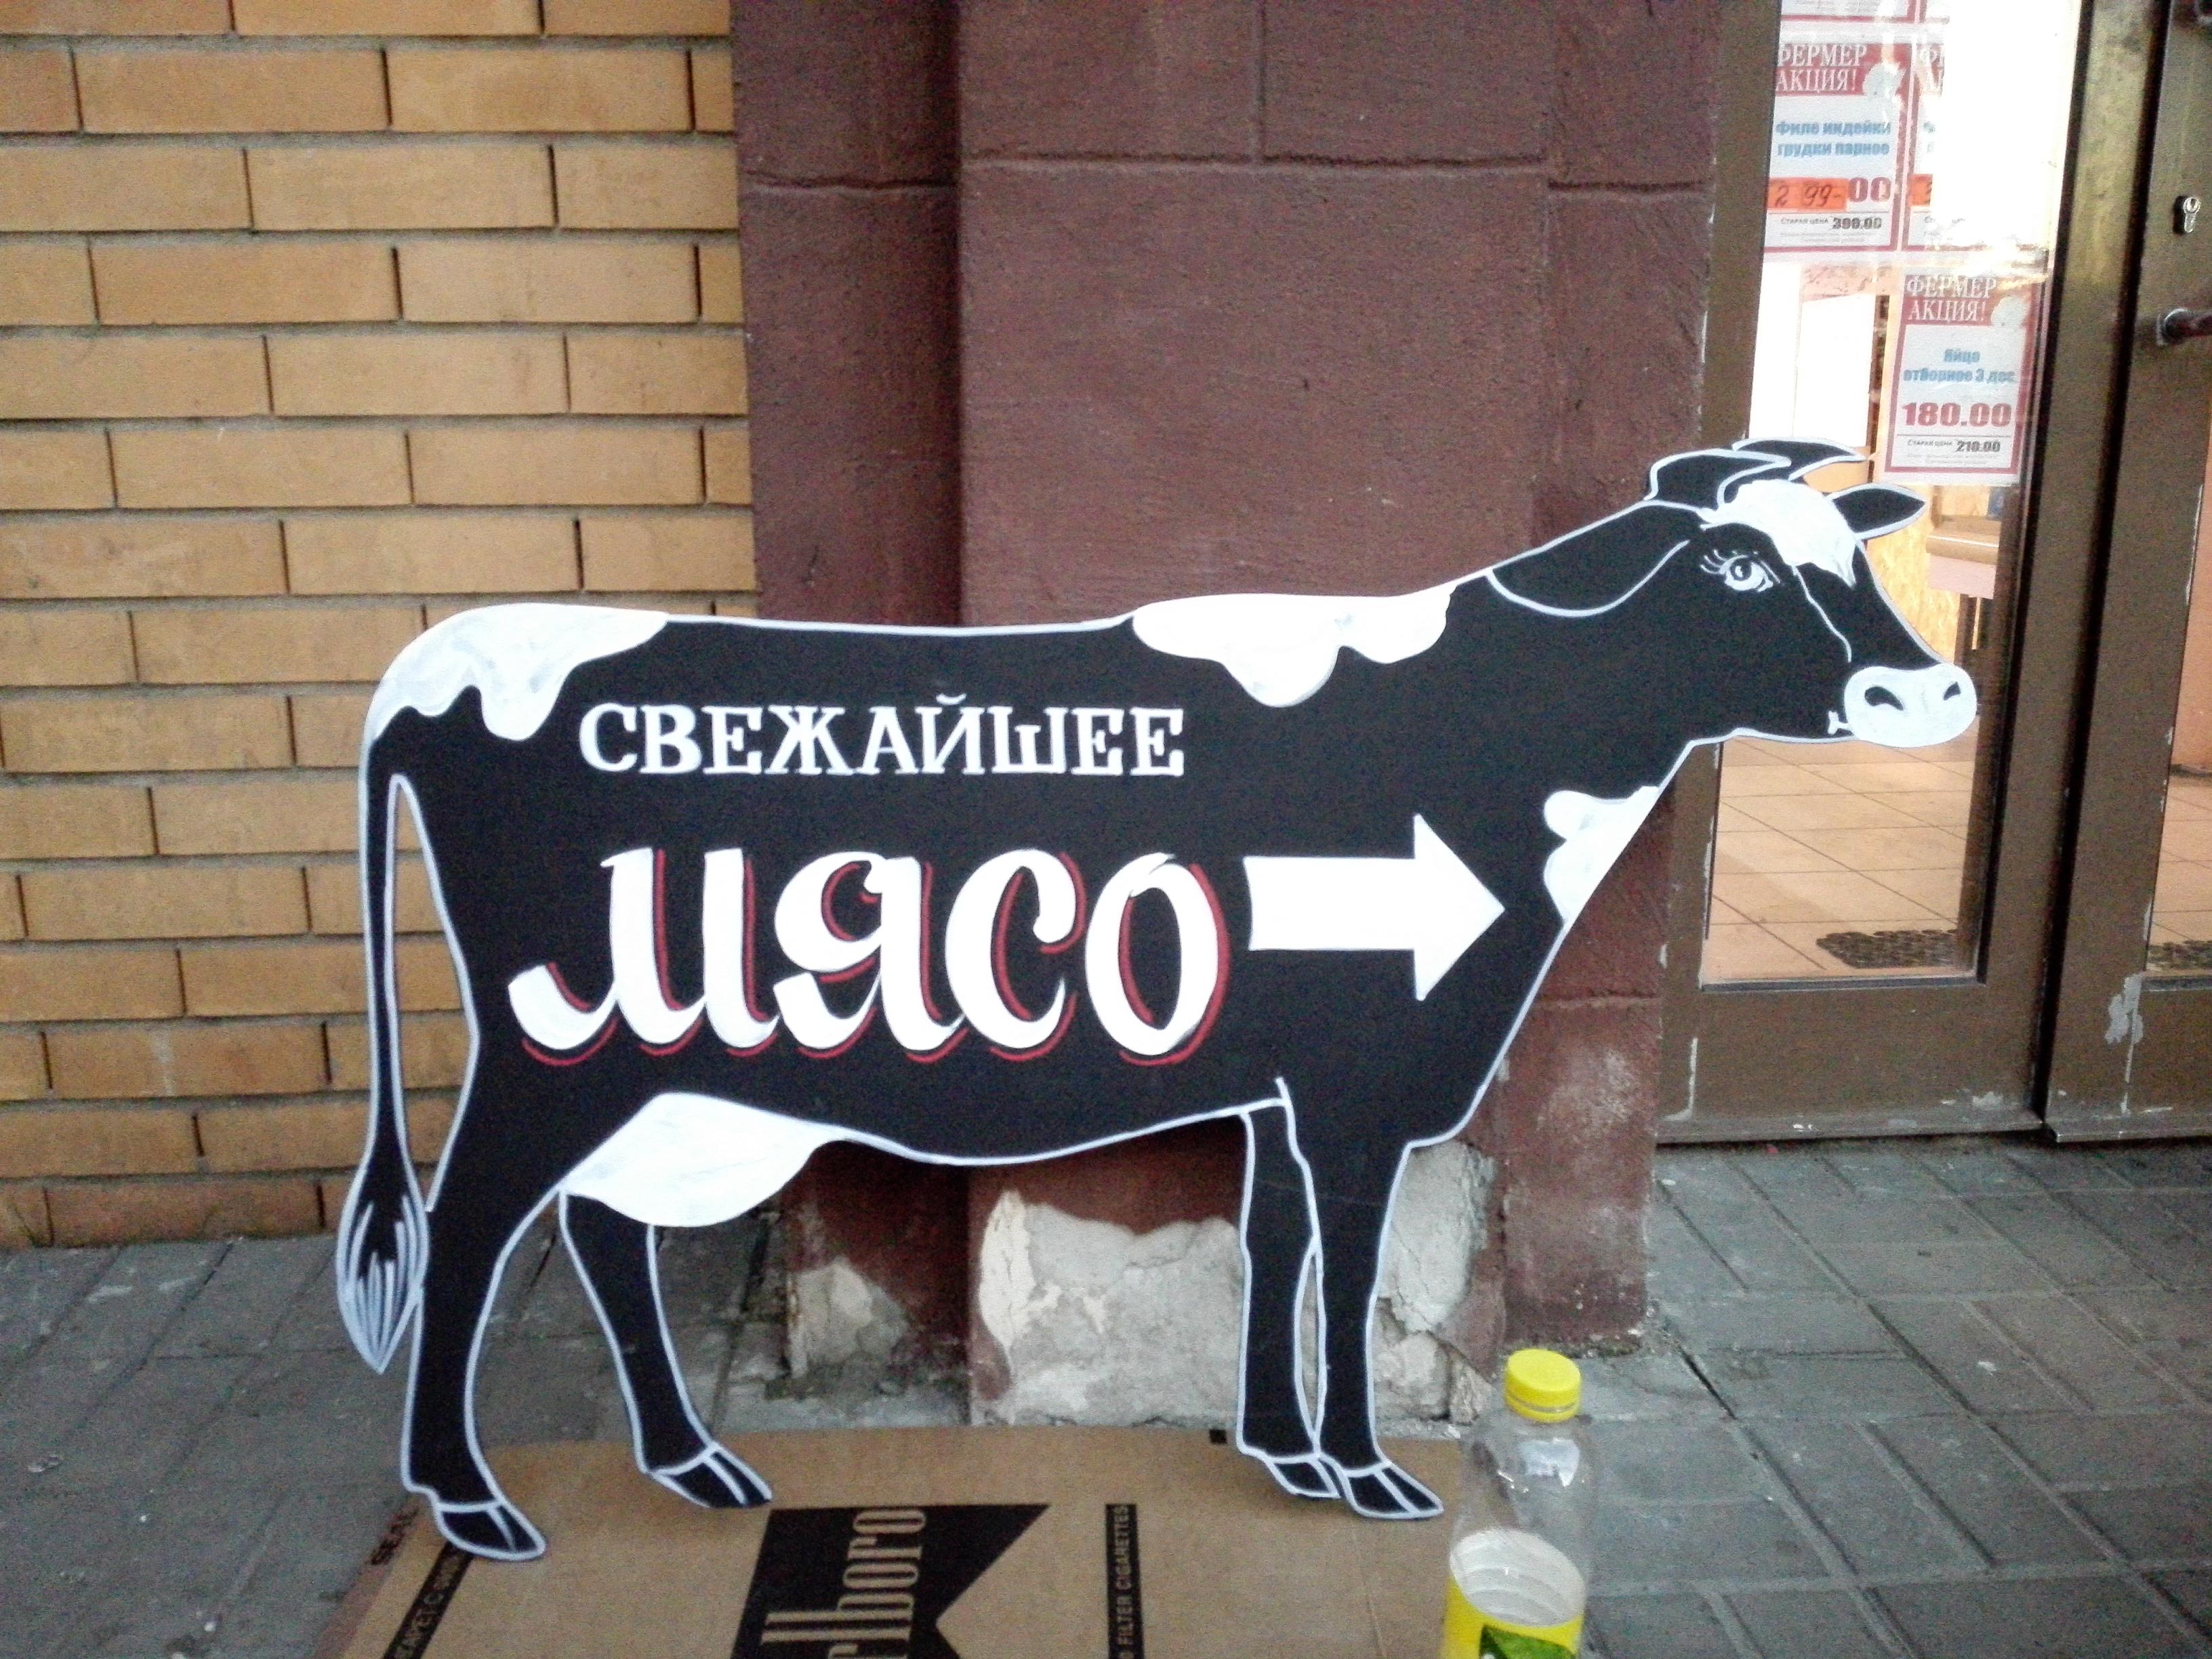 Меловая доска Корова. Грифельная доска Мясо.jpg